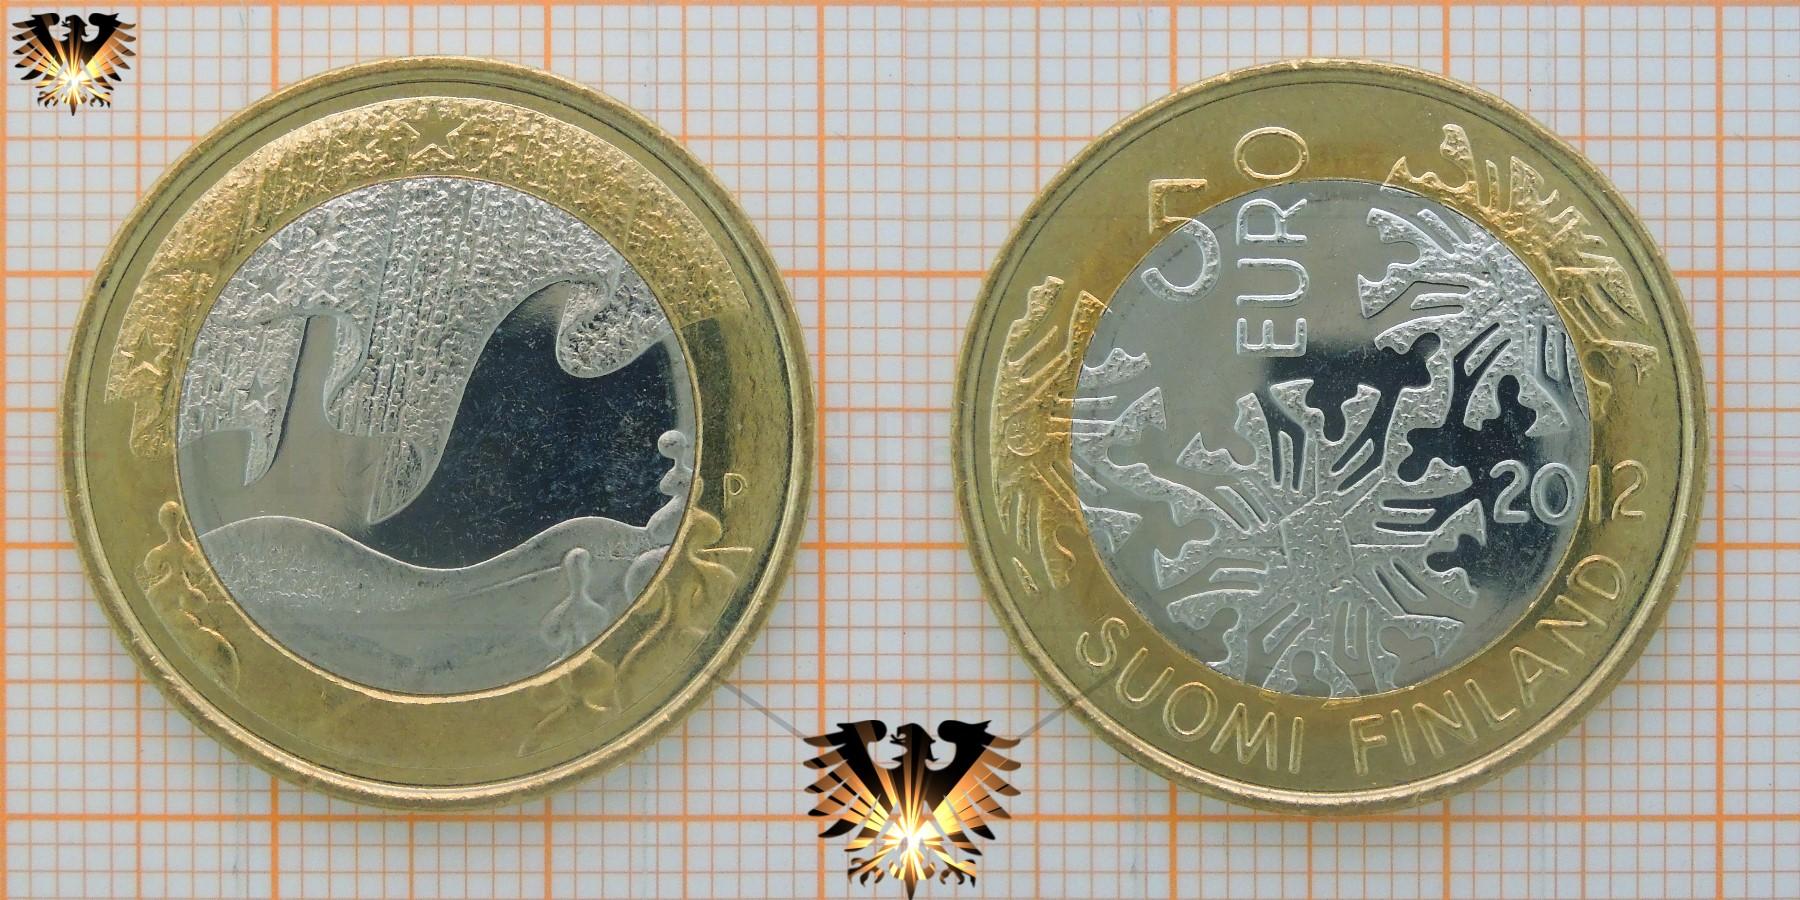 5 euro suomi finland 2012 p schneeflocken winter. Black Bedroom Furniture Sets. Home Design Ideas